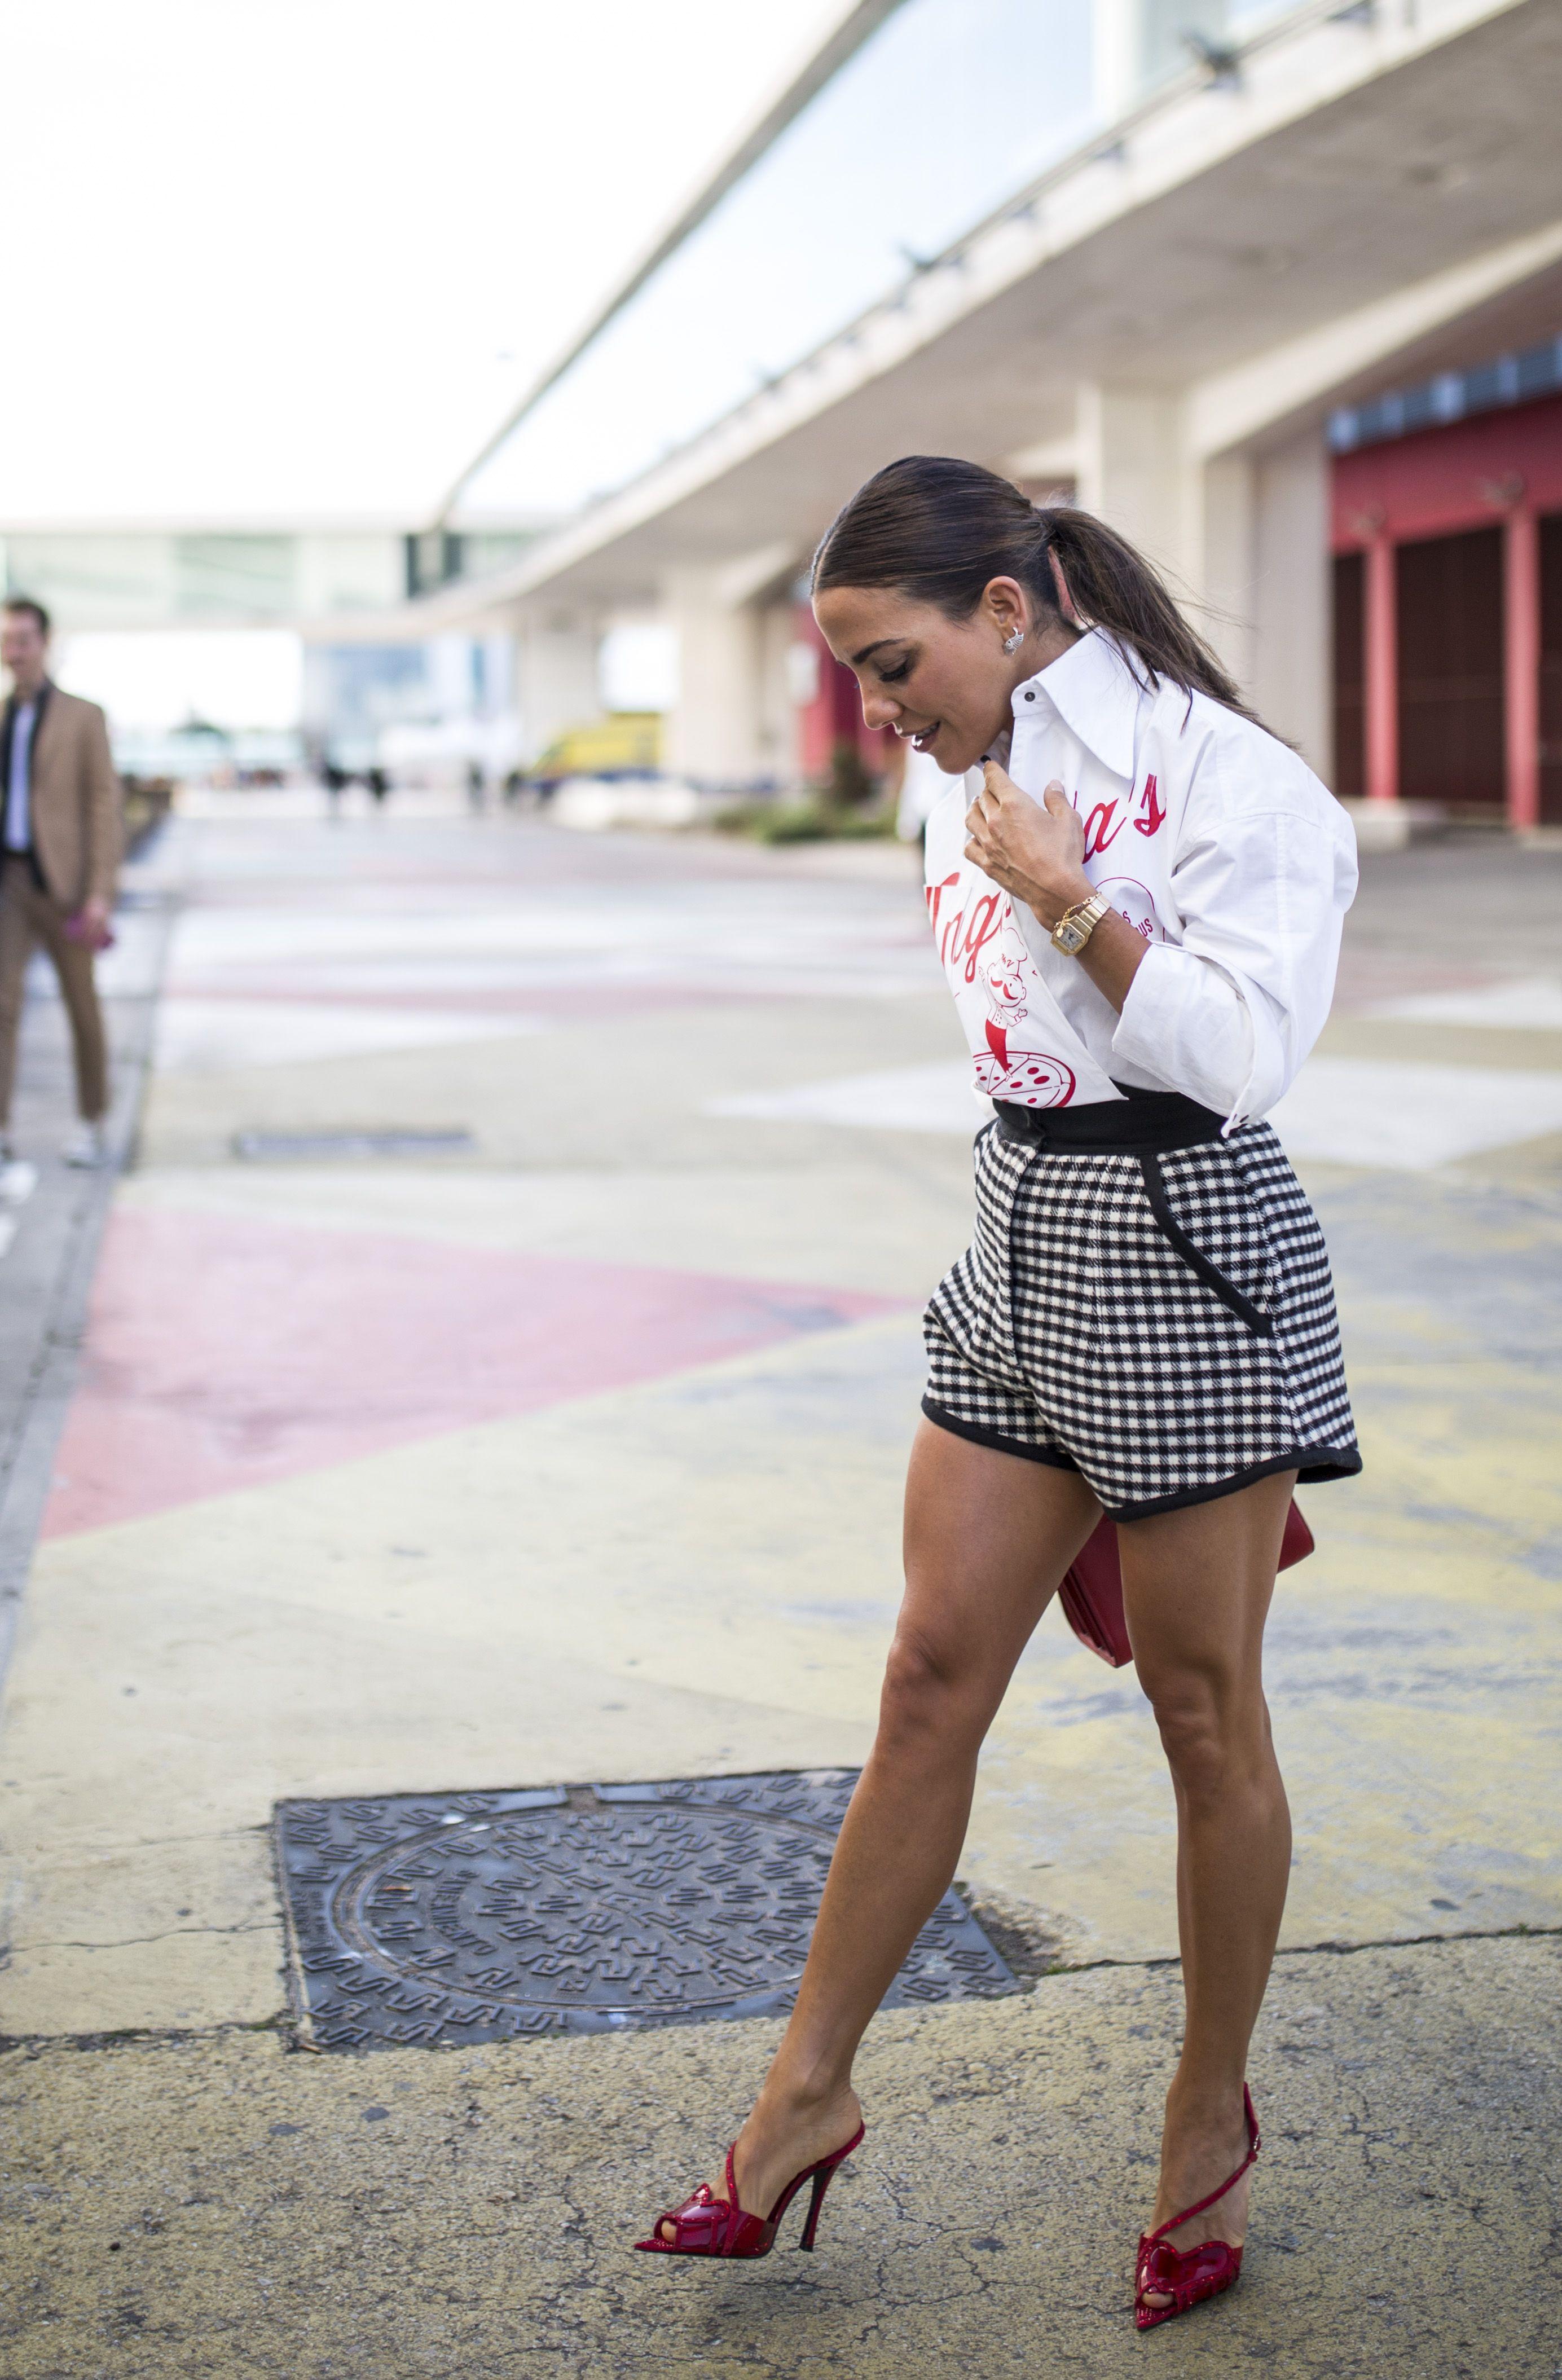 404 Not Found | Style, Fashion looks, Mens fashion